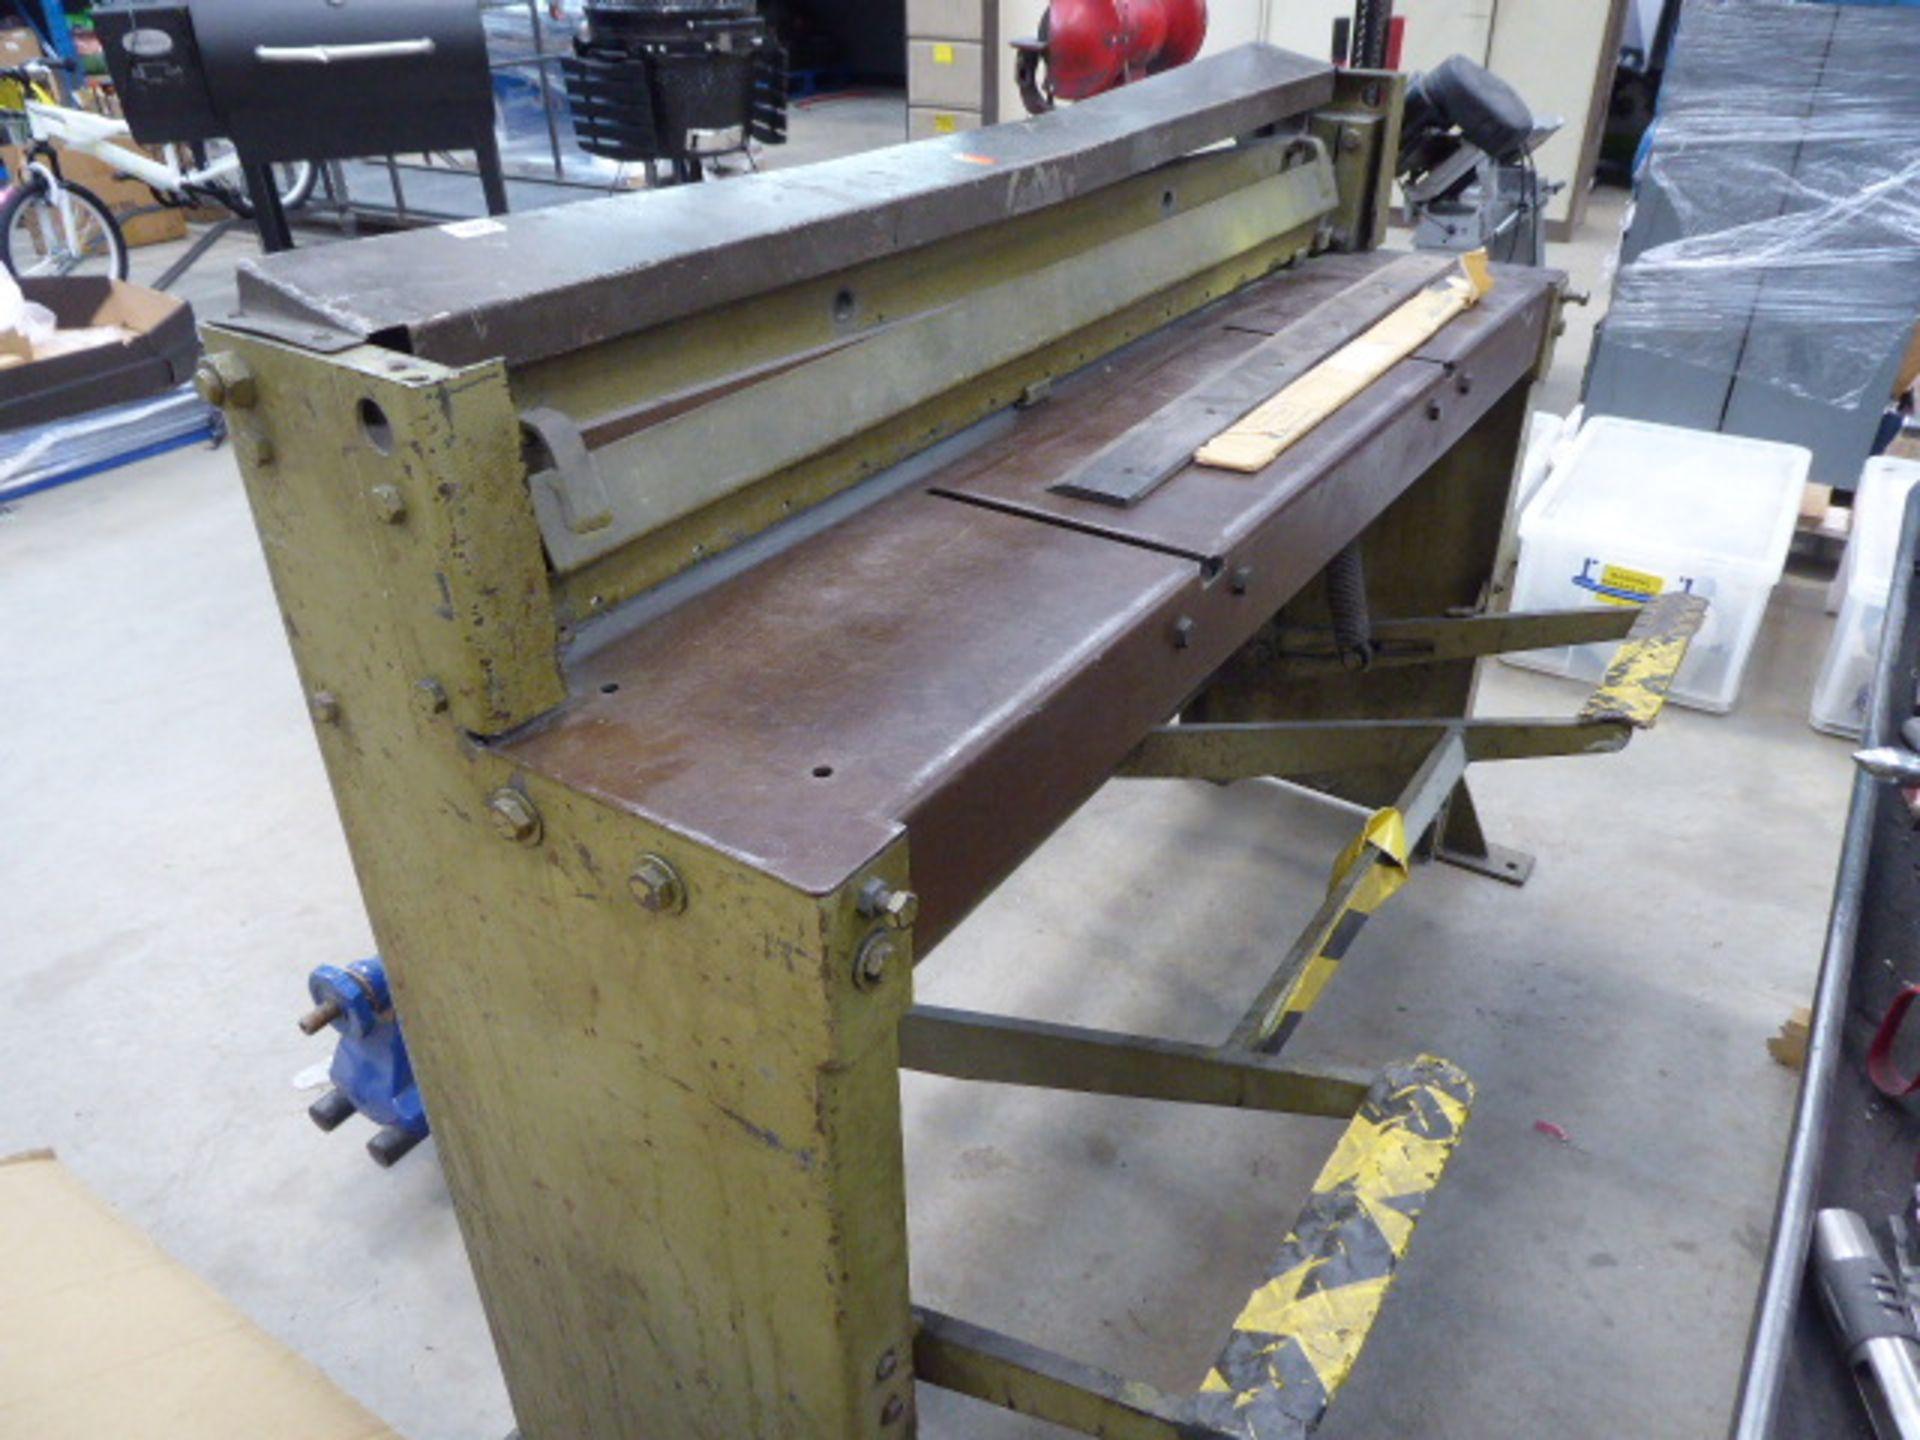 Edwards model 416 sheet metal guillotine - Image 2 of 2